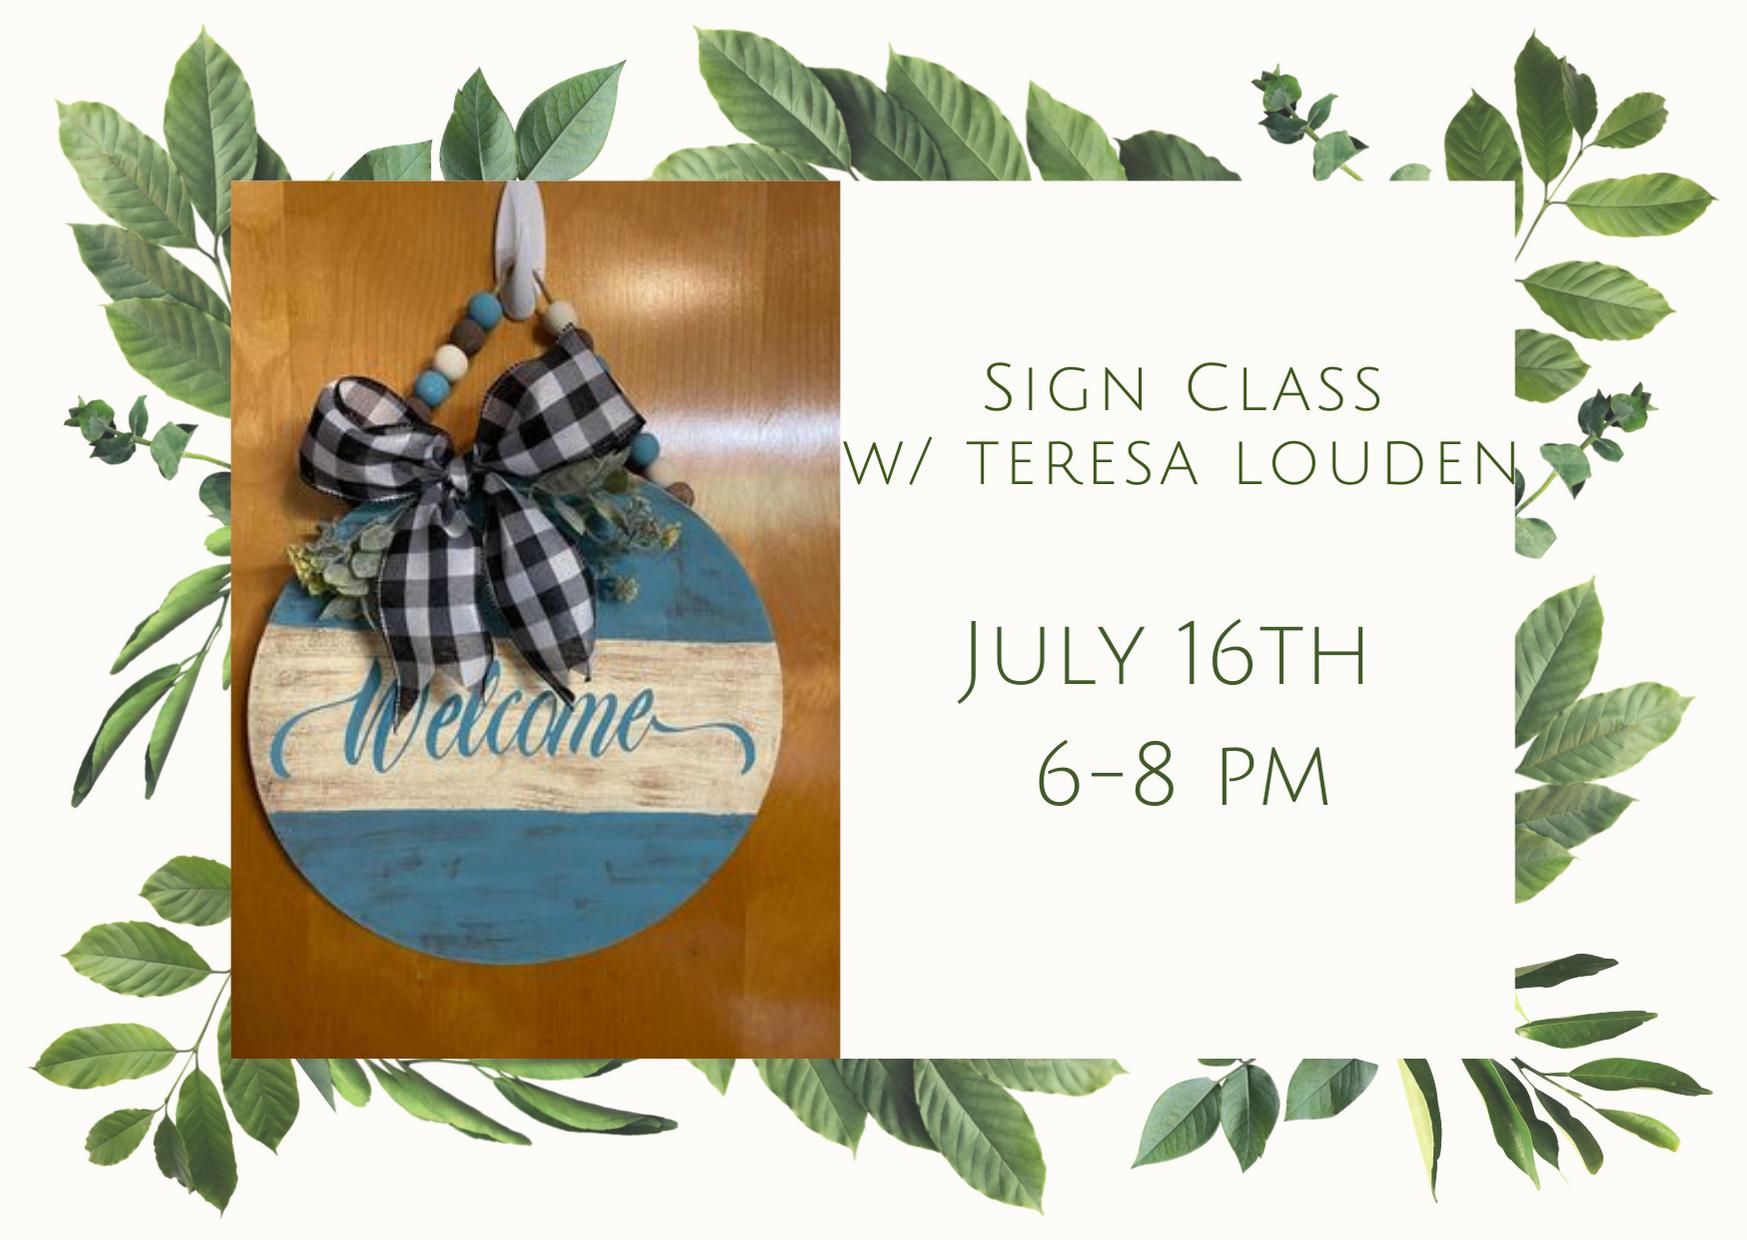 Sign Class w/ Teresa Louden